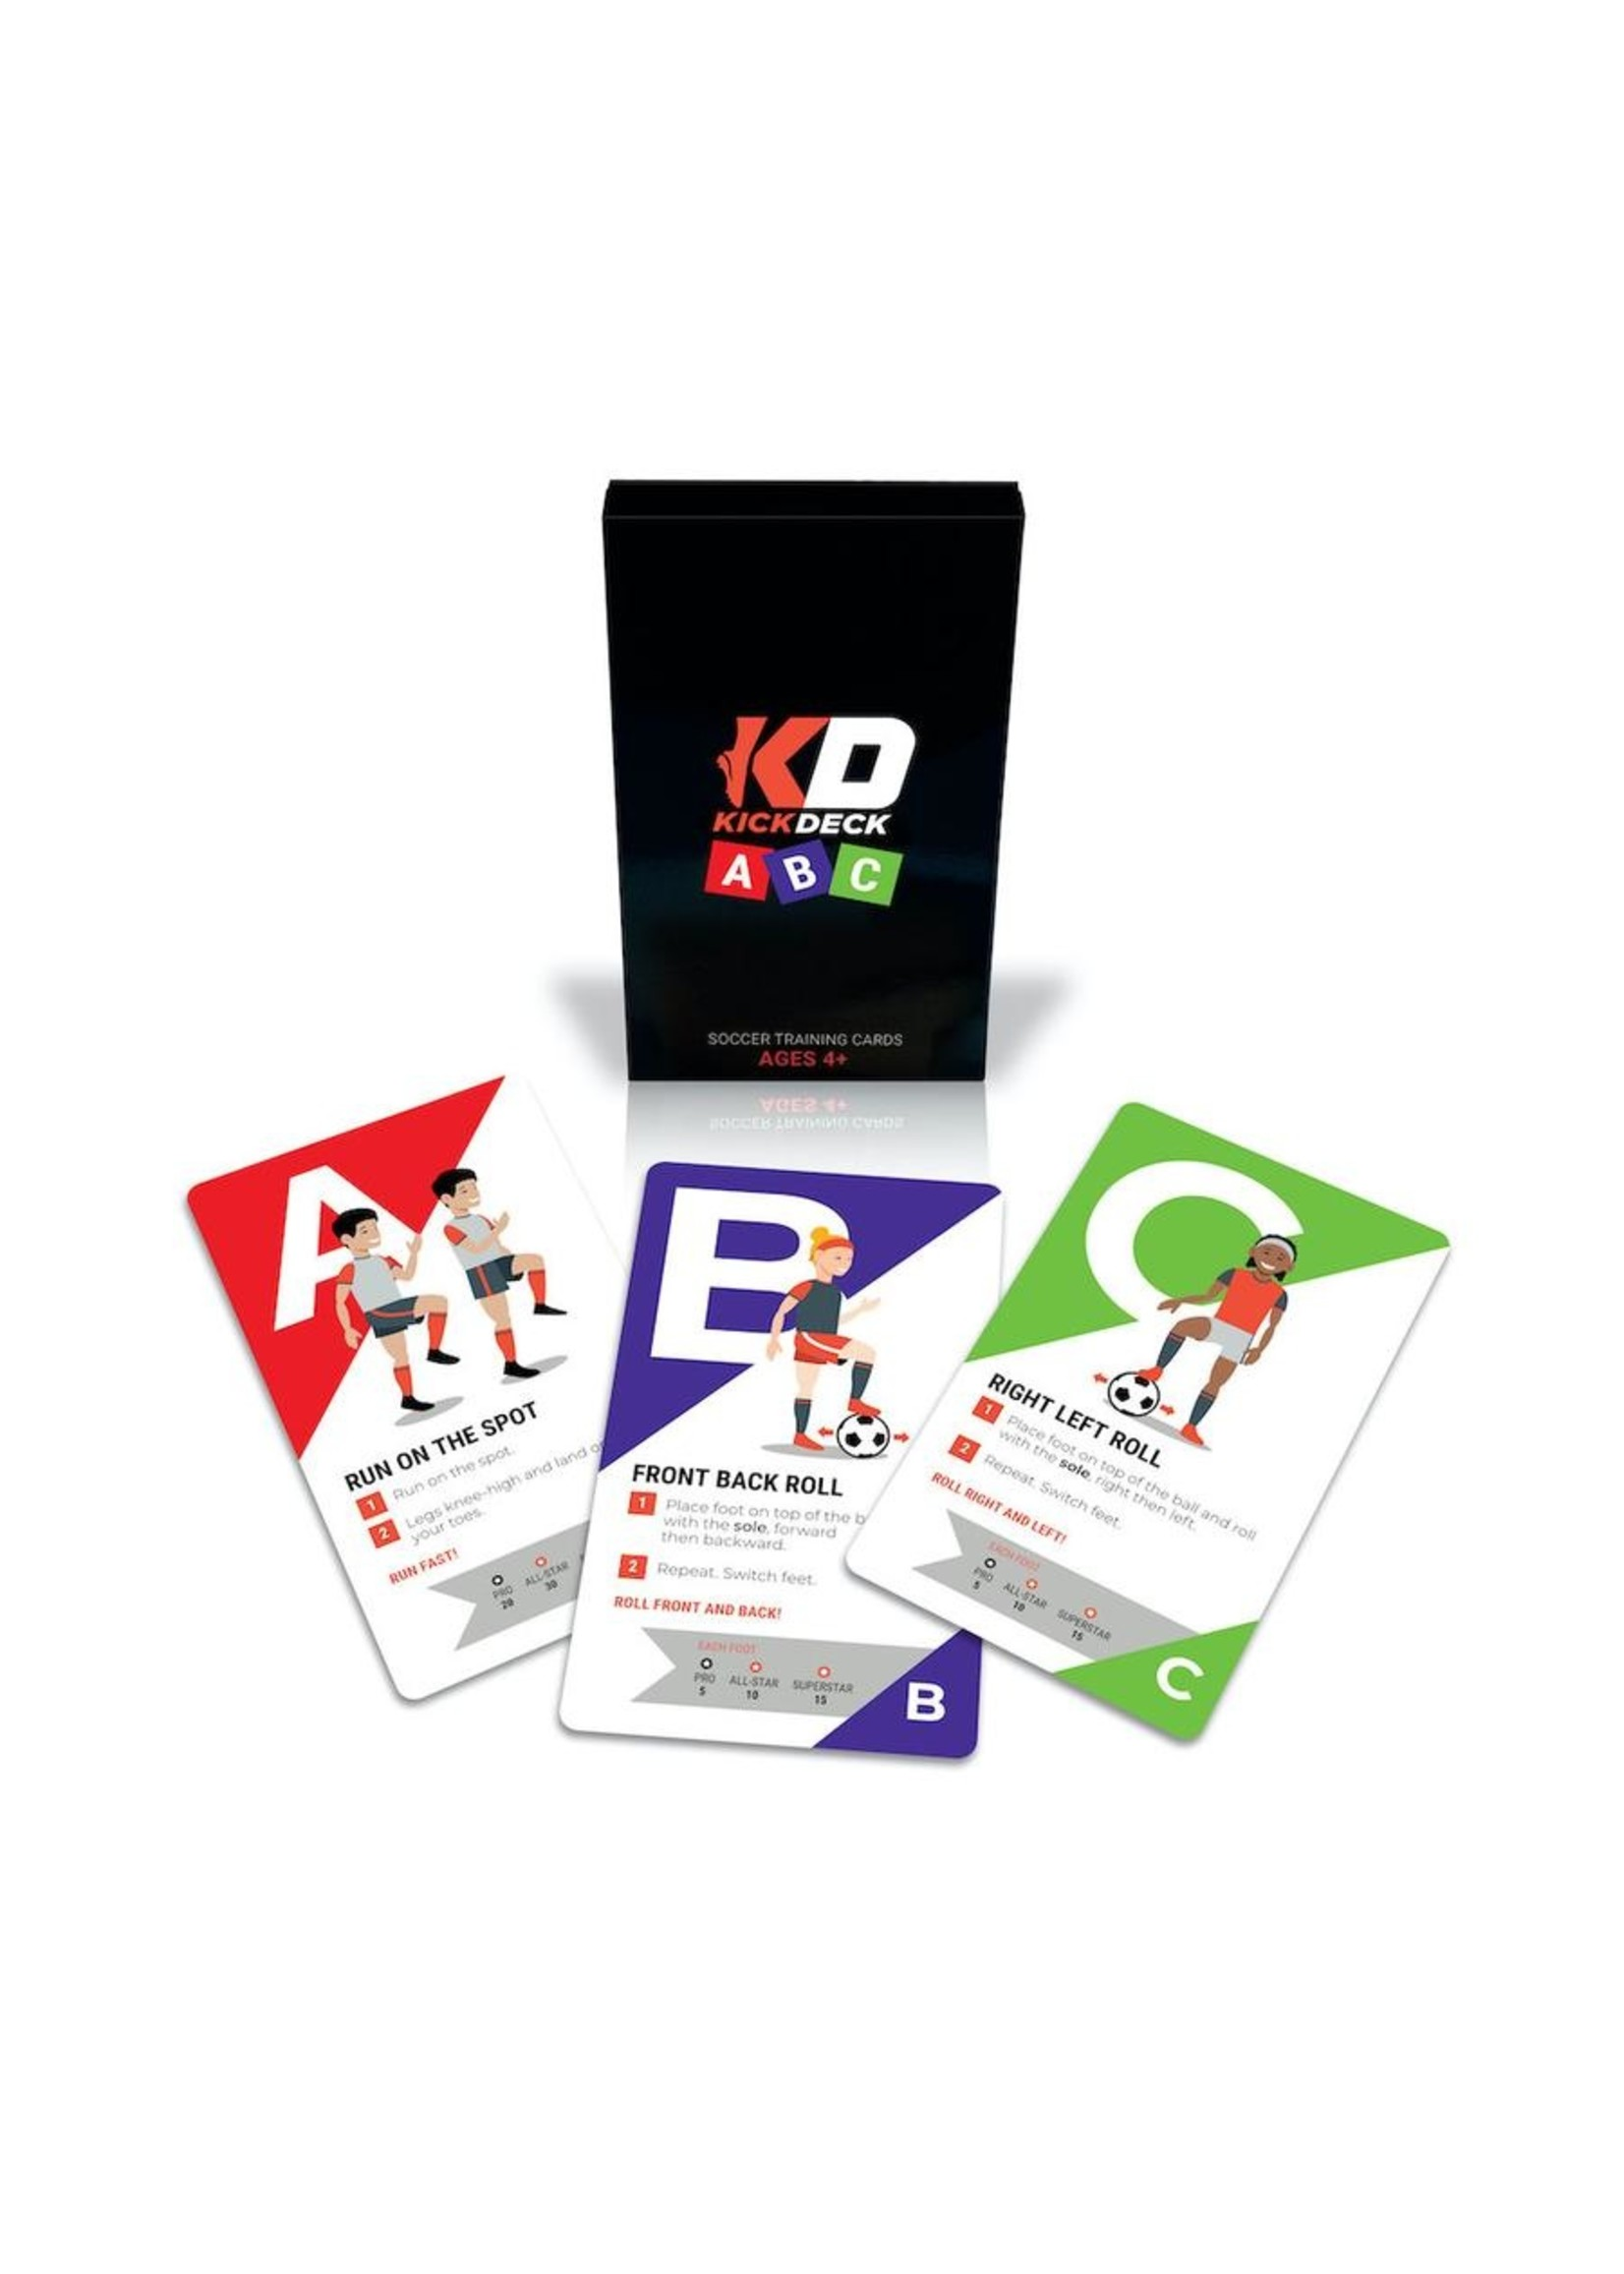 KickDeck ABC Cards